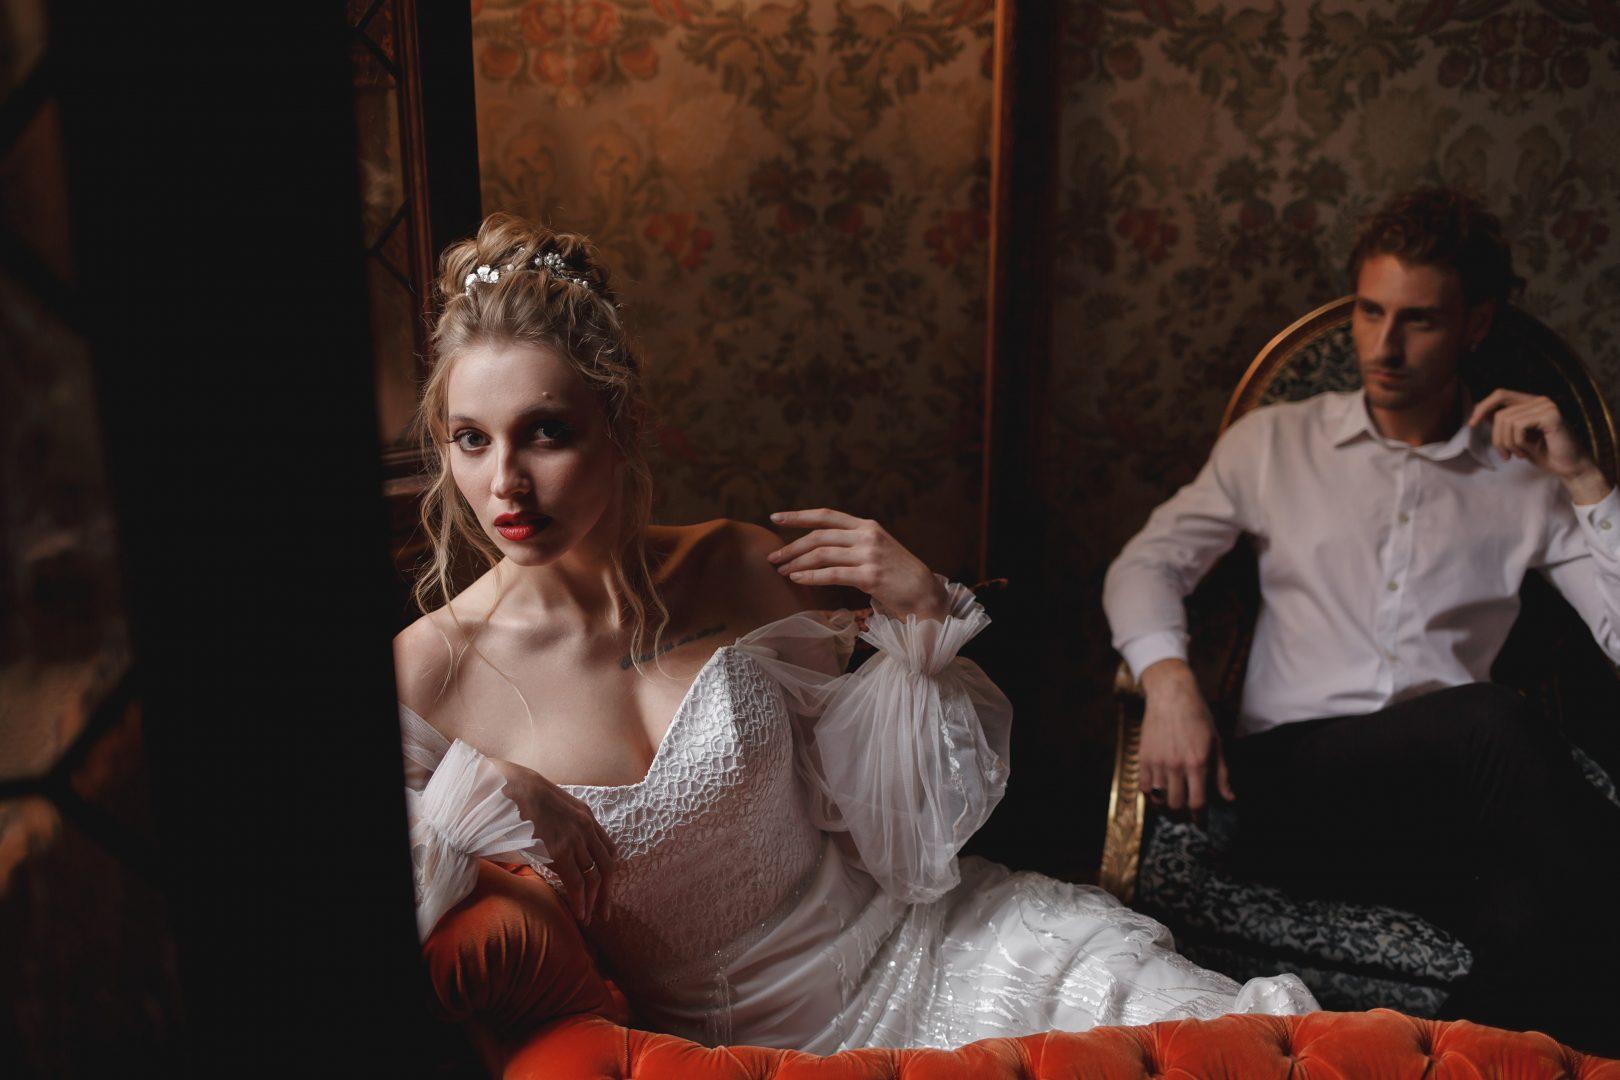 Danilz & Liliya